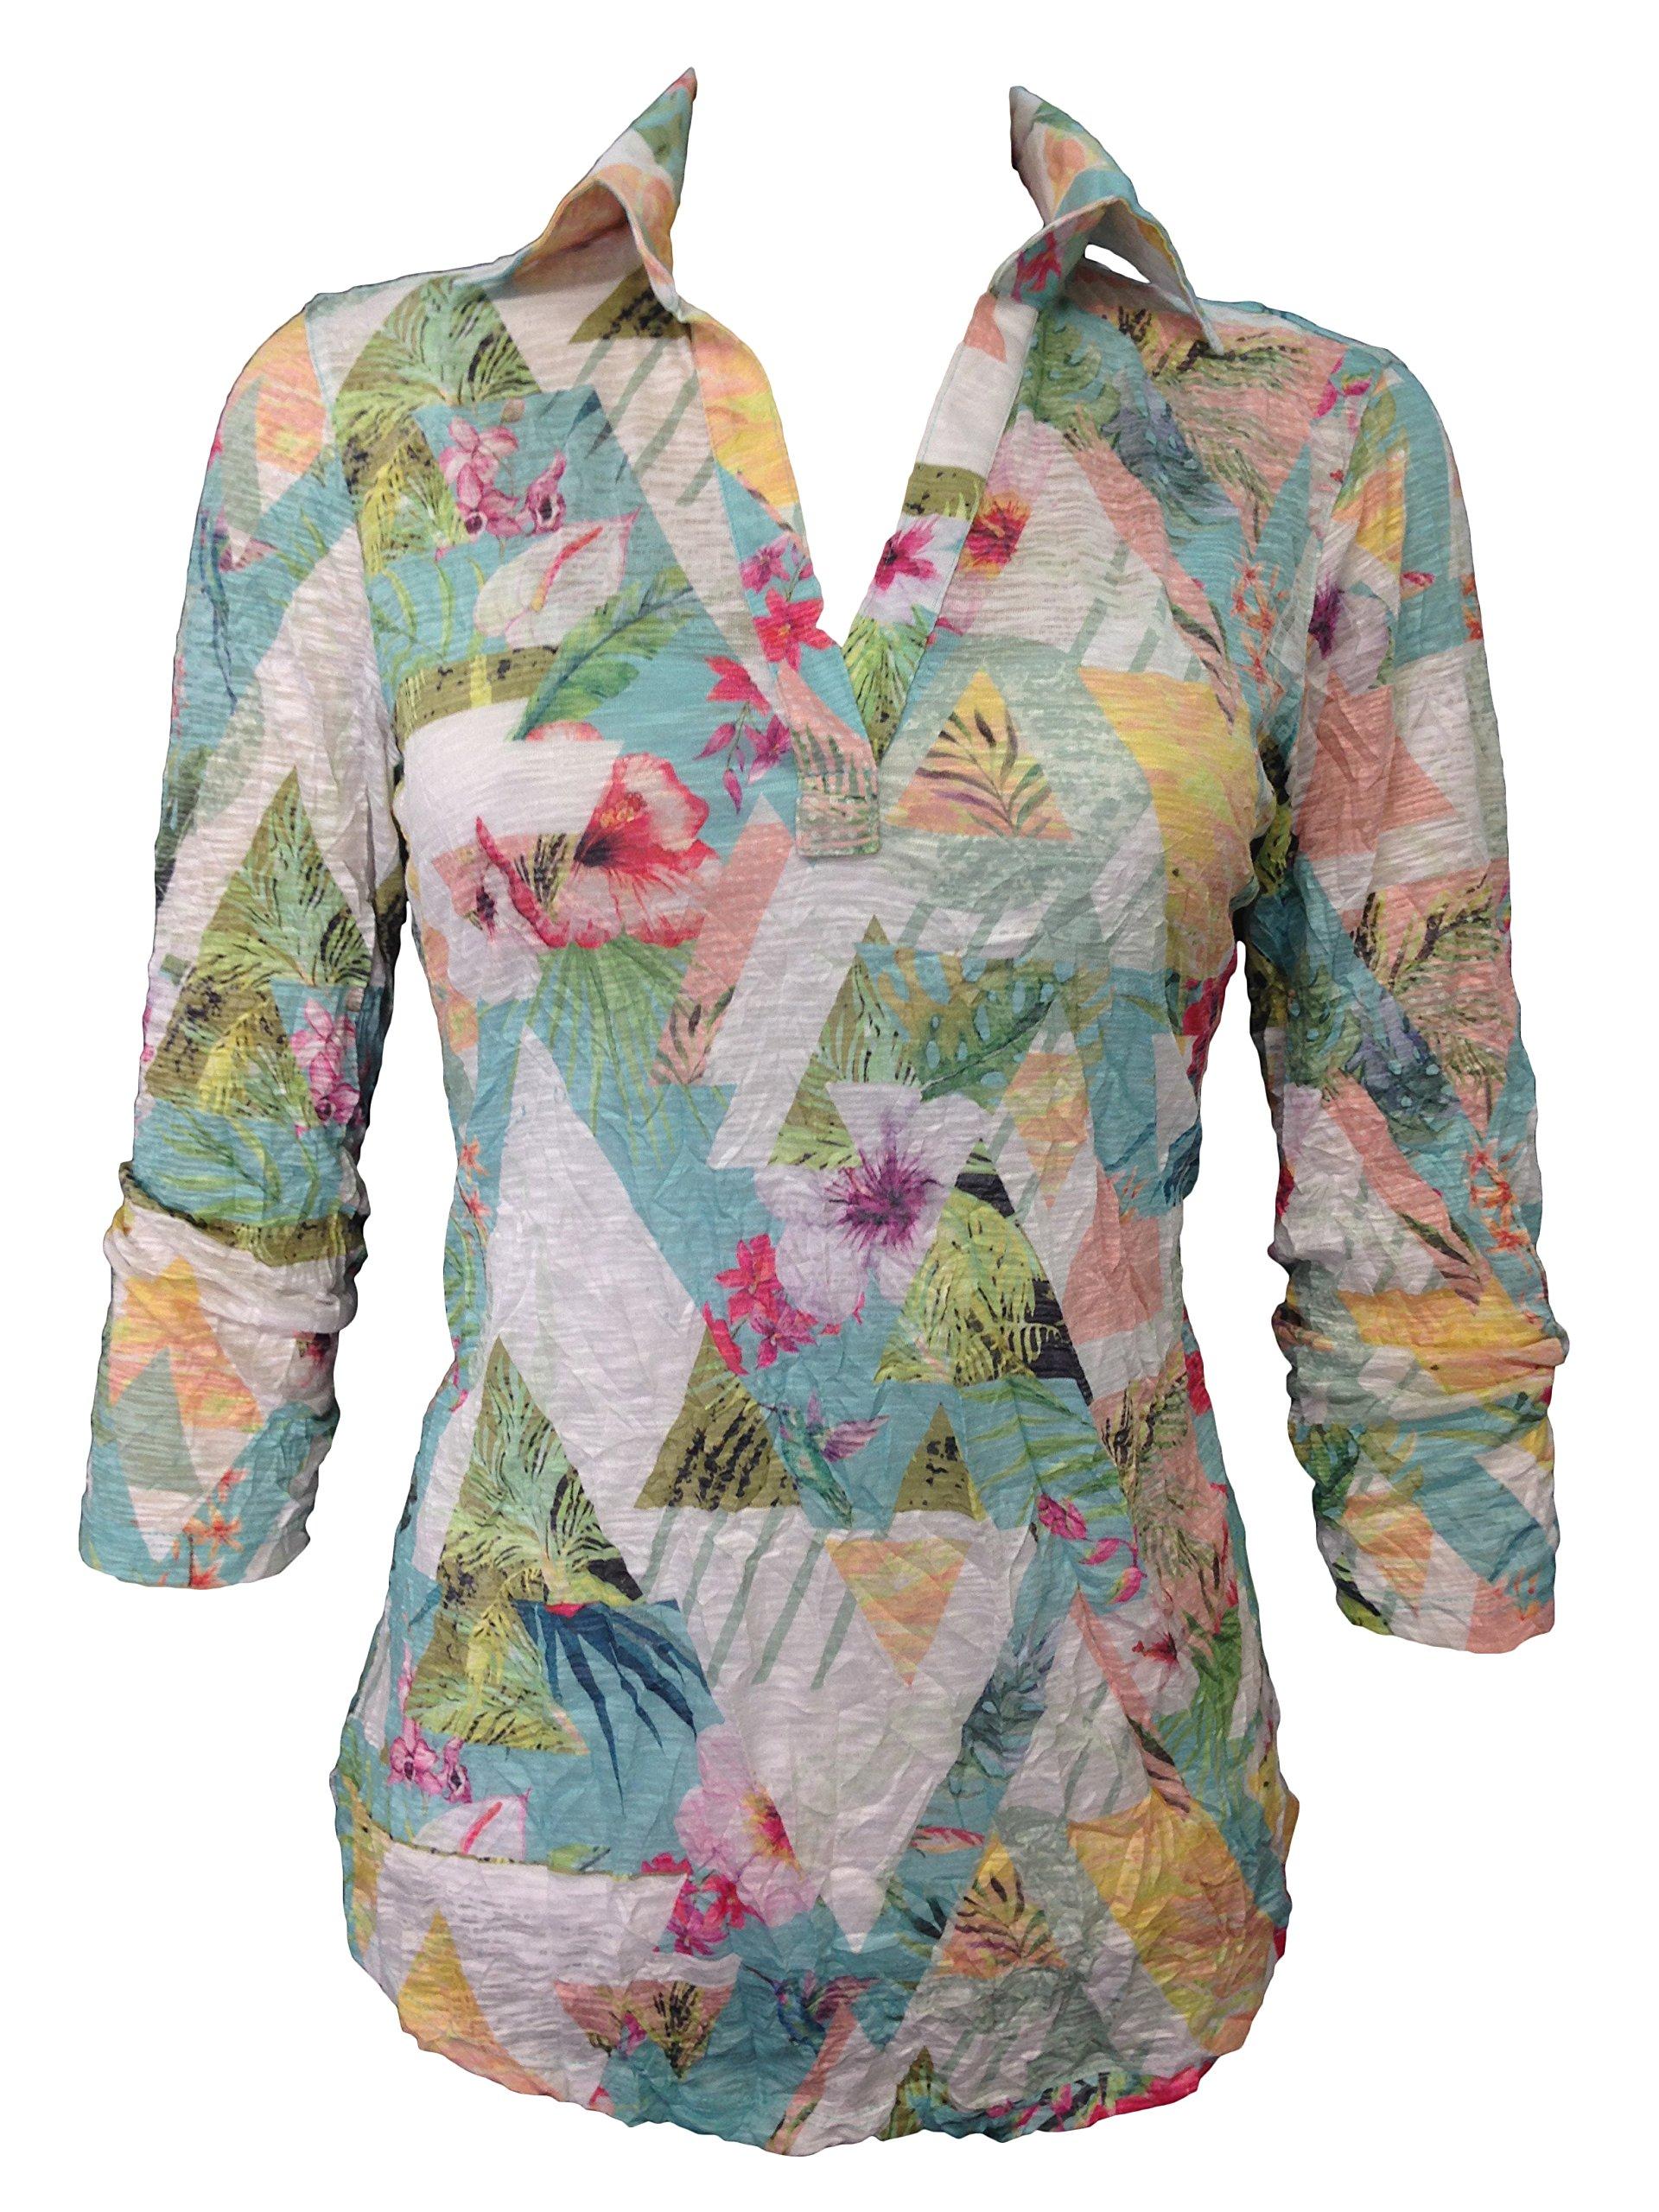 David Cline Woman's Vero Polo Crushed Shirt. Super Soft Fabric.